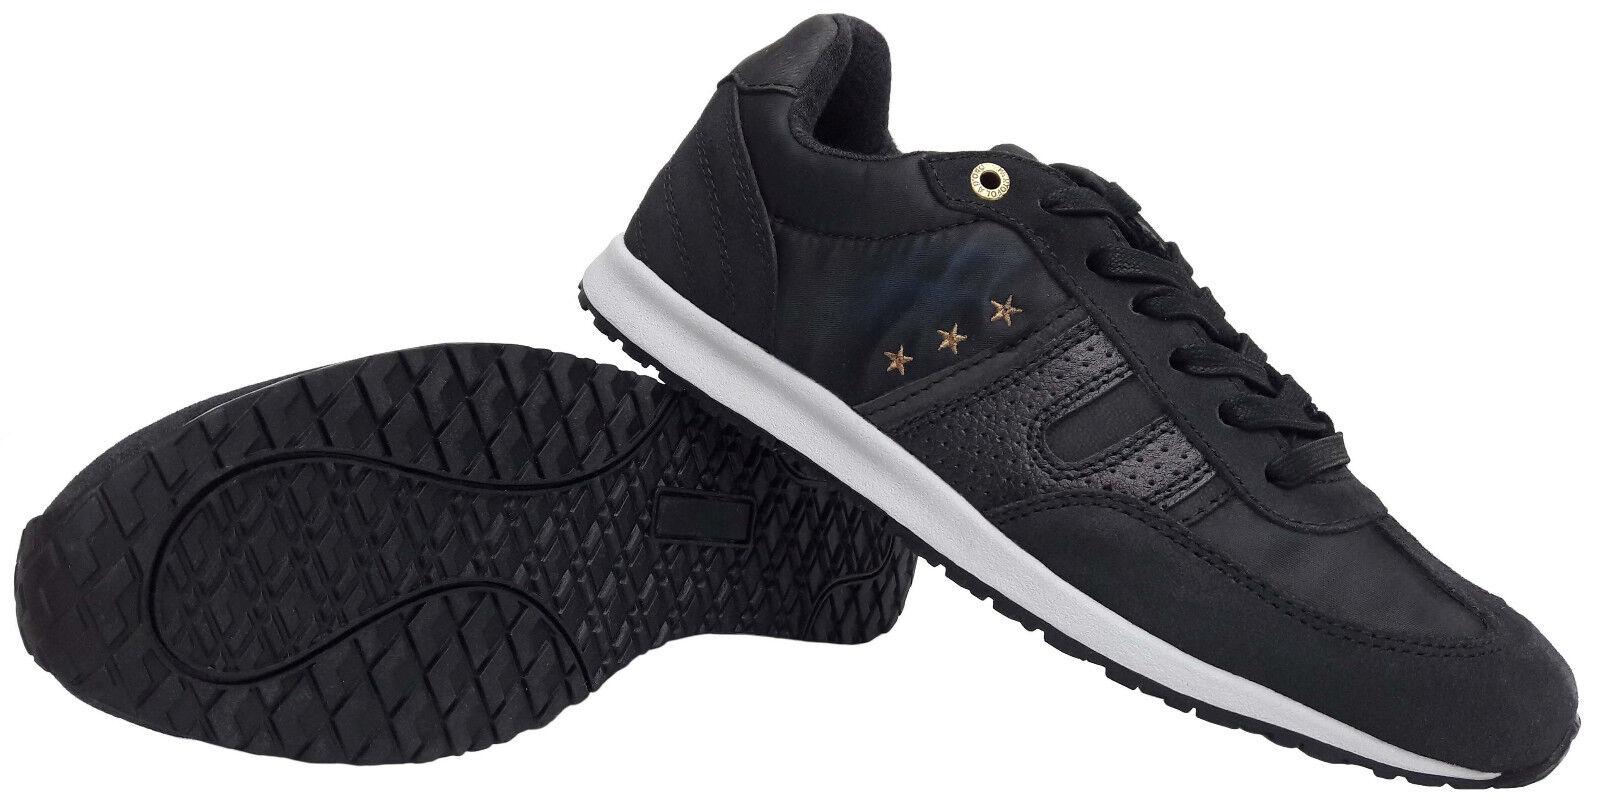 Pantofola d'Oro Acadia Low Damen Leder Sneaker Gr. Schuhe 38 Used Look Freizeit Schuhe Gr. f3cbc0